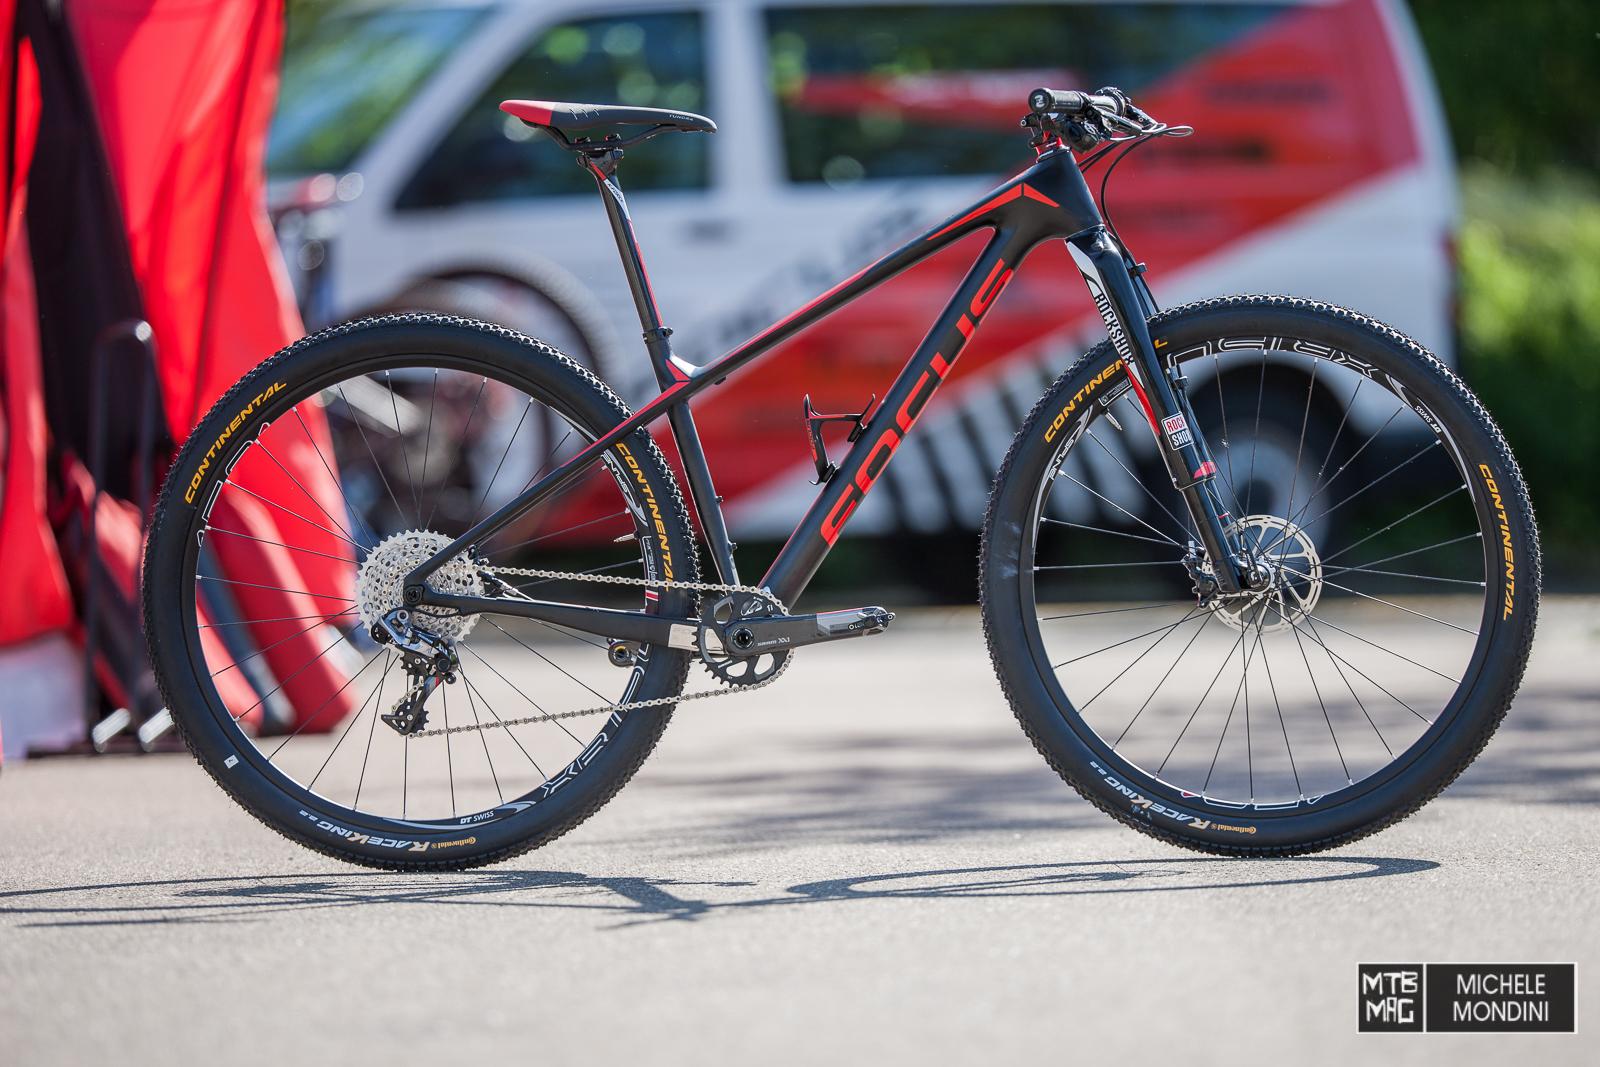 29er Mountain Bike >> MTB-MAG.COM - Mountain Bike Magazine | New Focus Raven Max